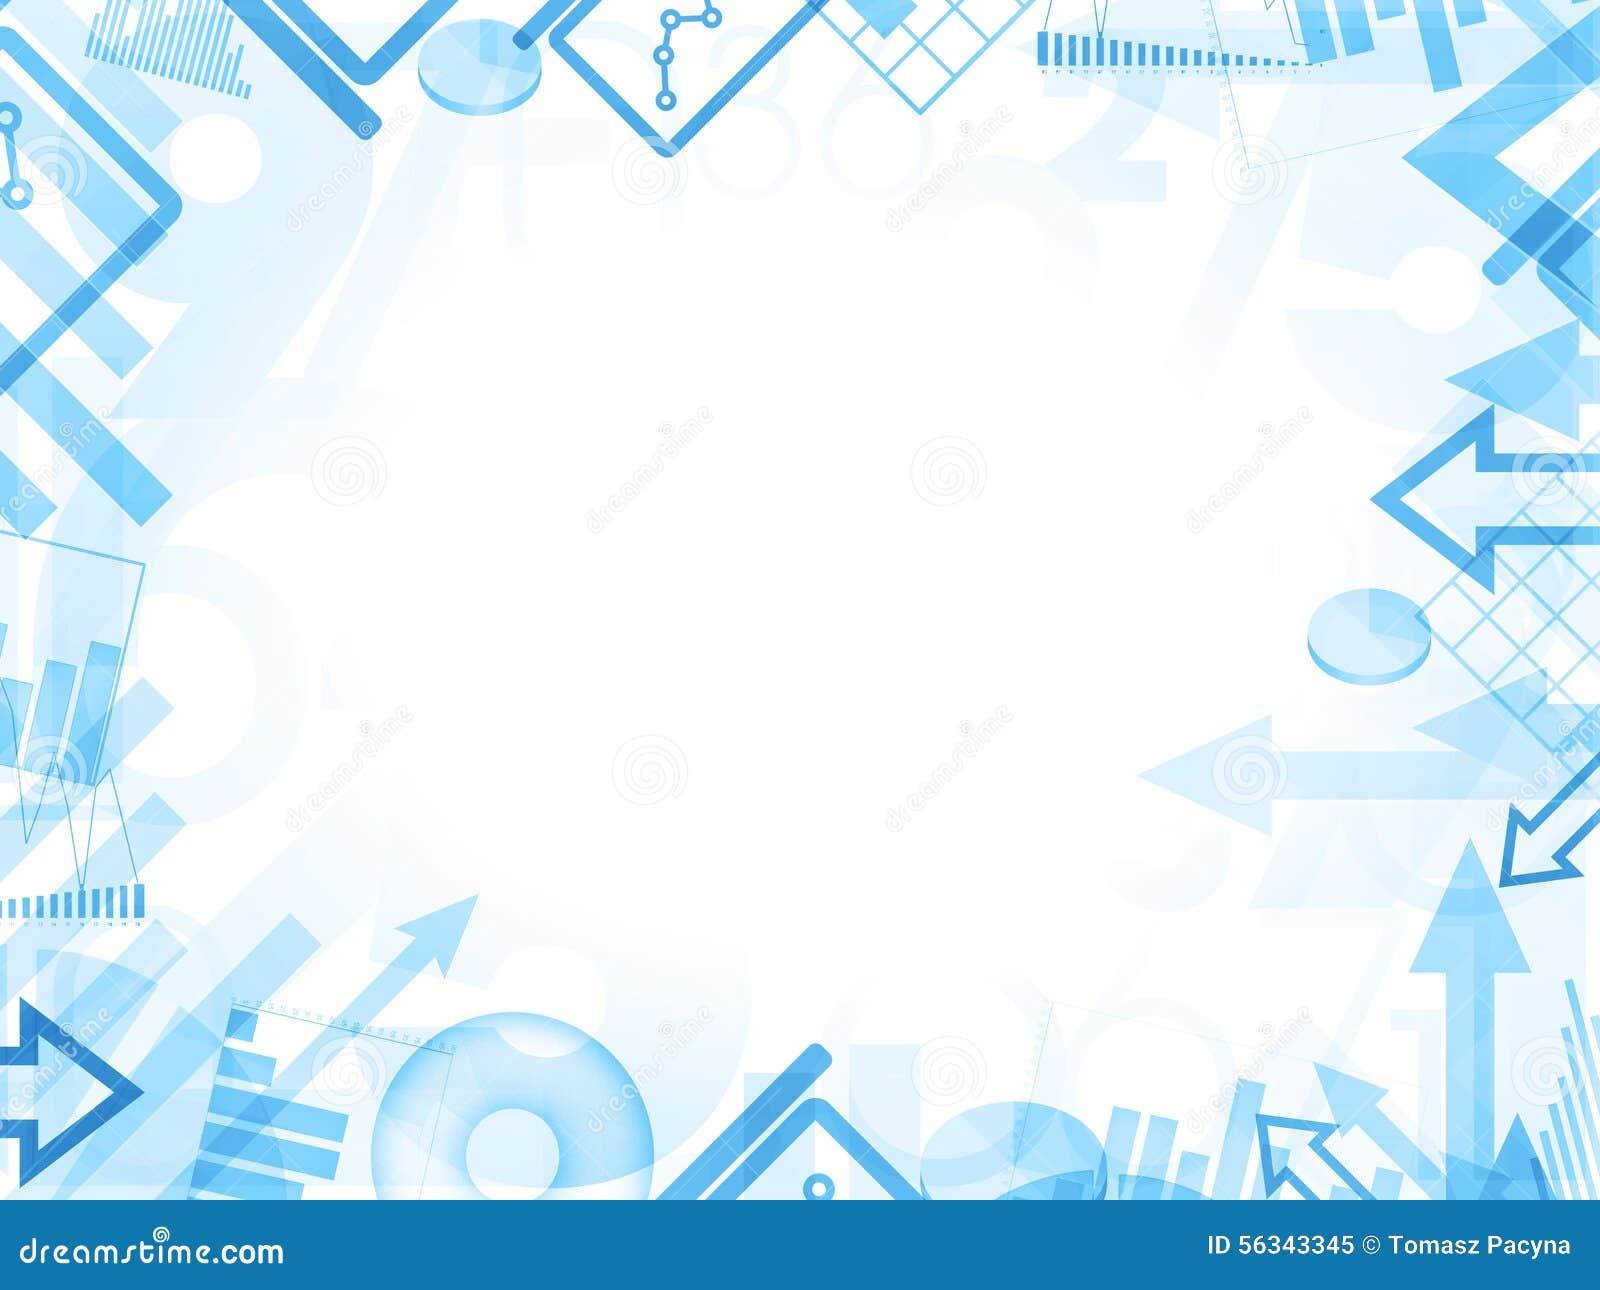 Abstract Statistics Blue Background Frame Border Stock Illustration ...